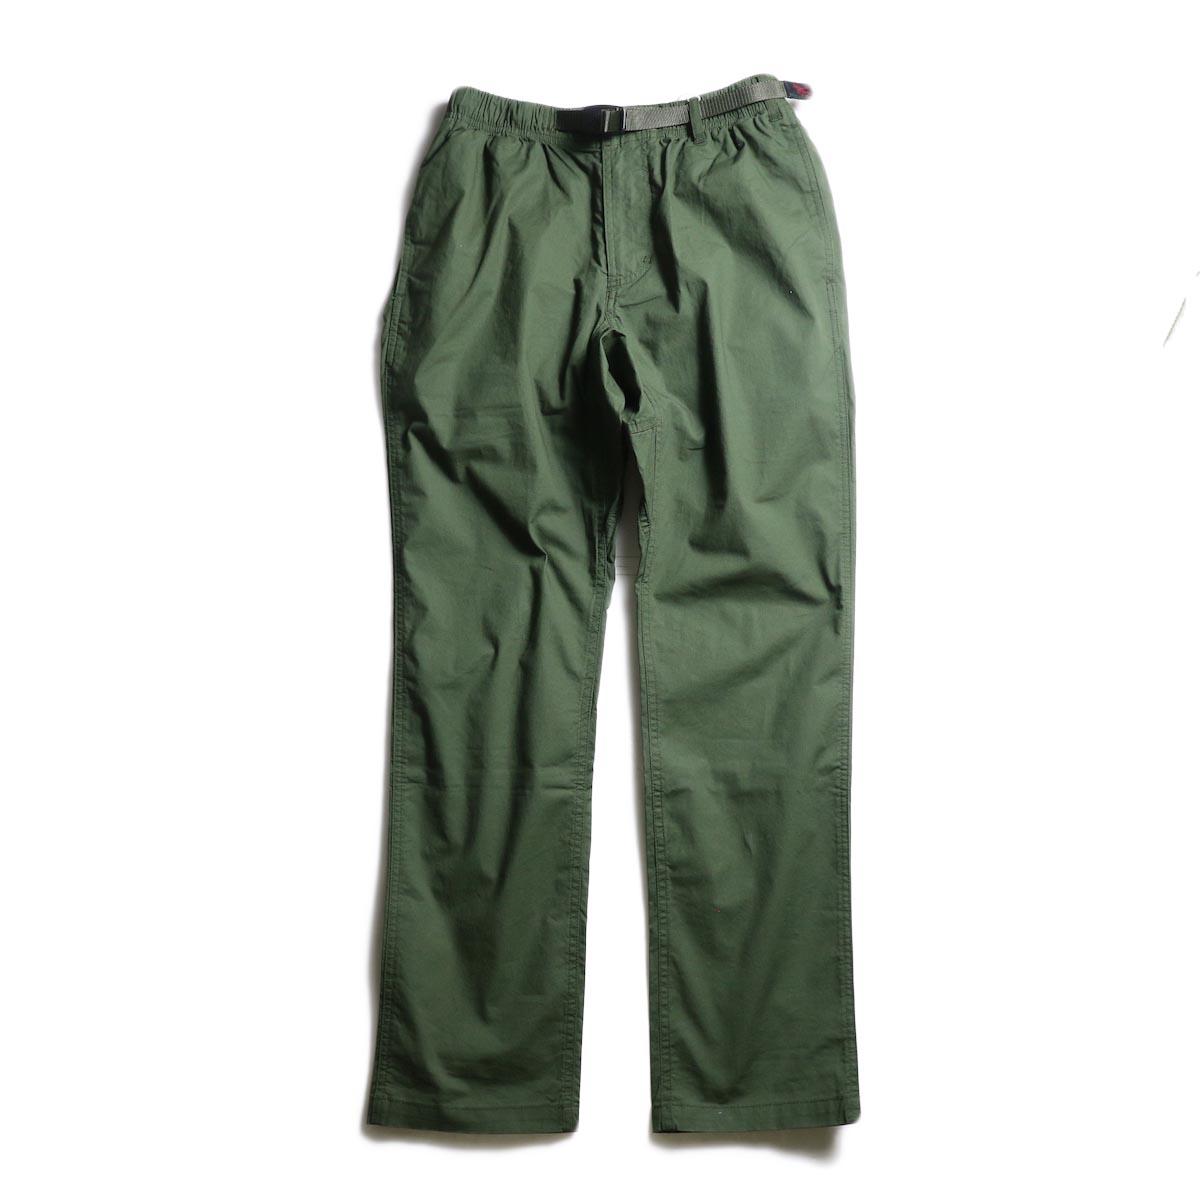 GRAMICCI / Weather NN-Pants Just Cut (Deep Olive)